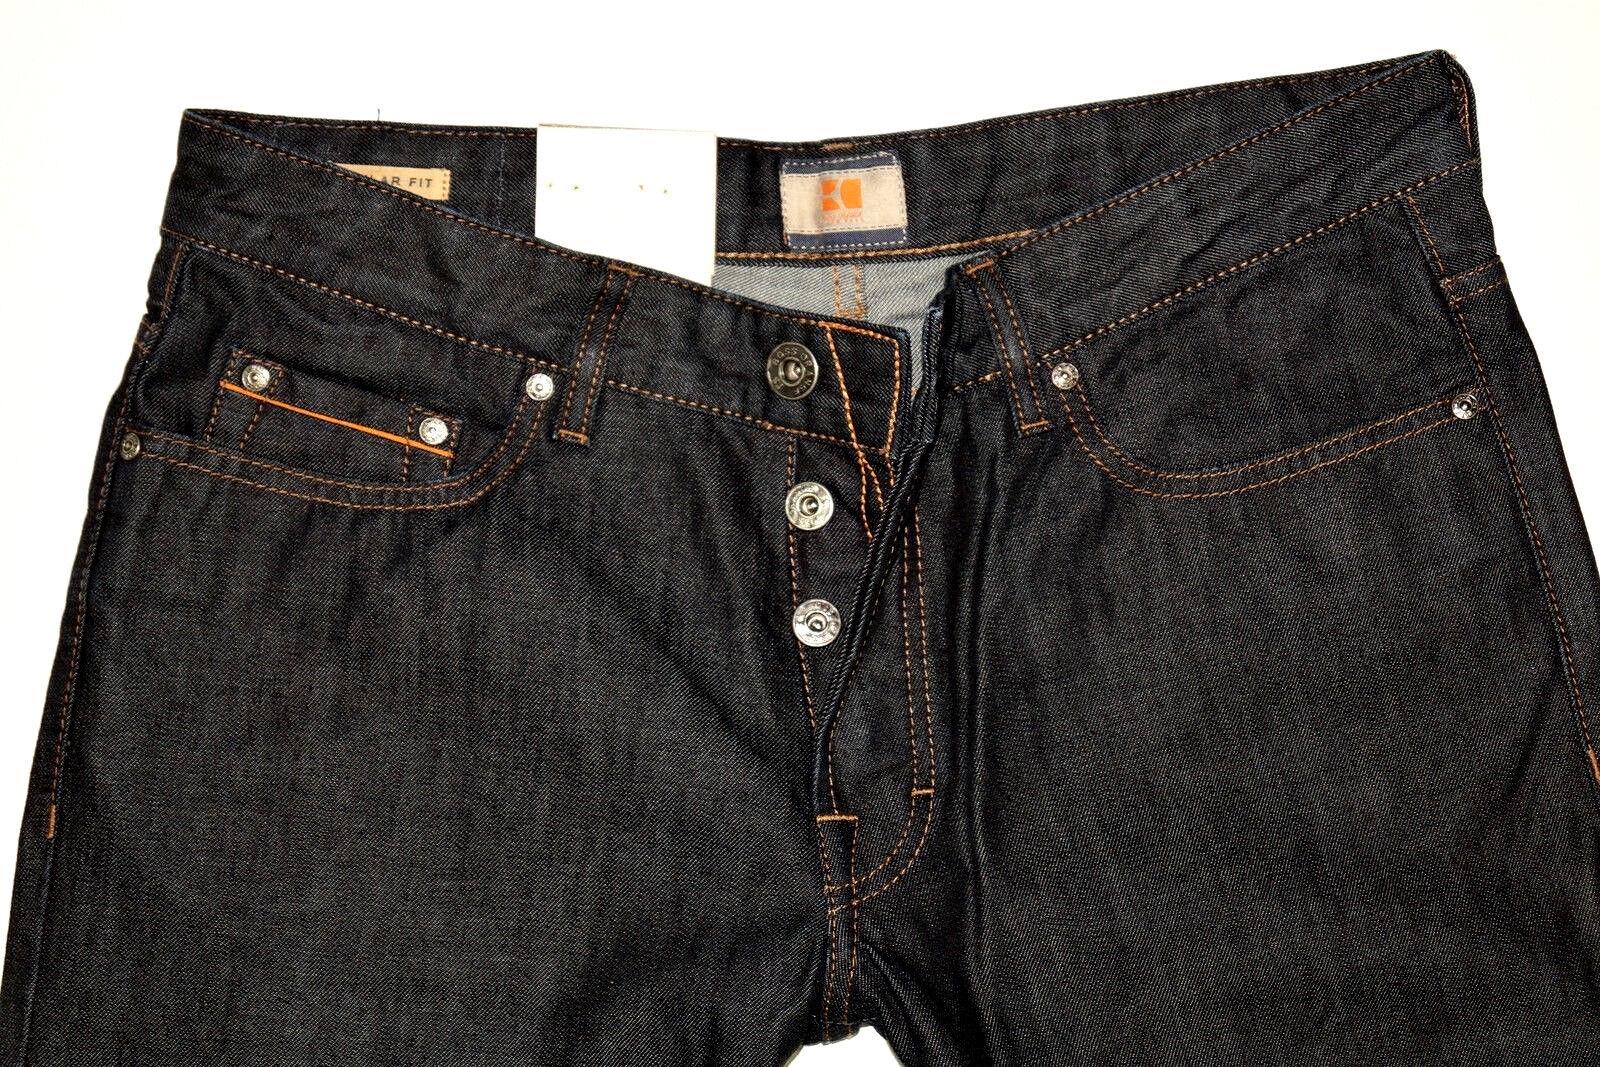 Hugo Boss   31 34   orange 31   Pure Denim   Regular Jeans   W31 L34